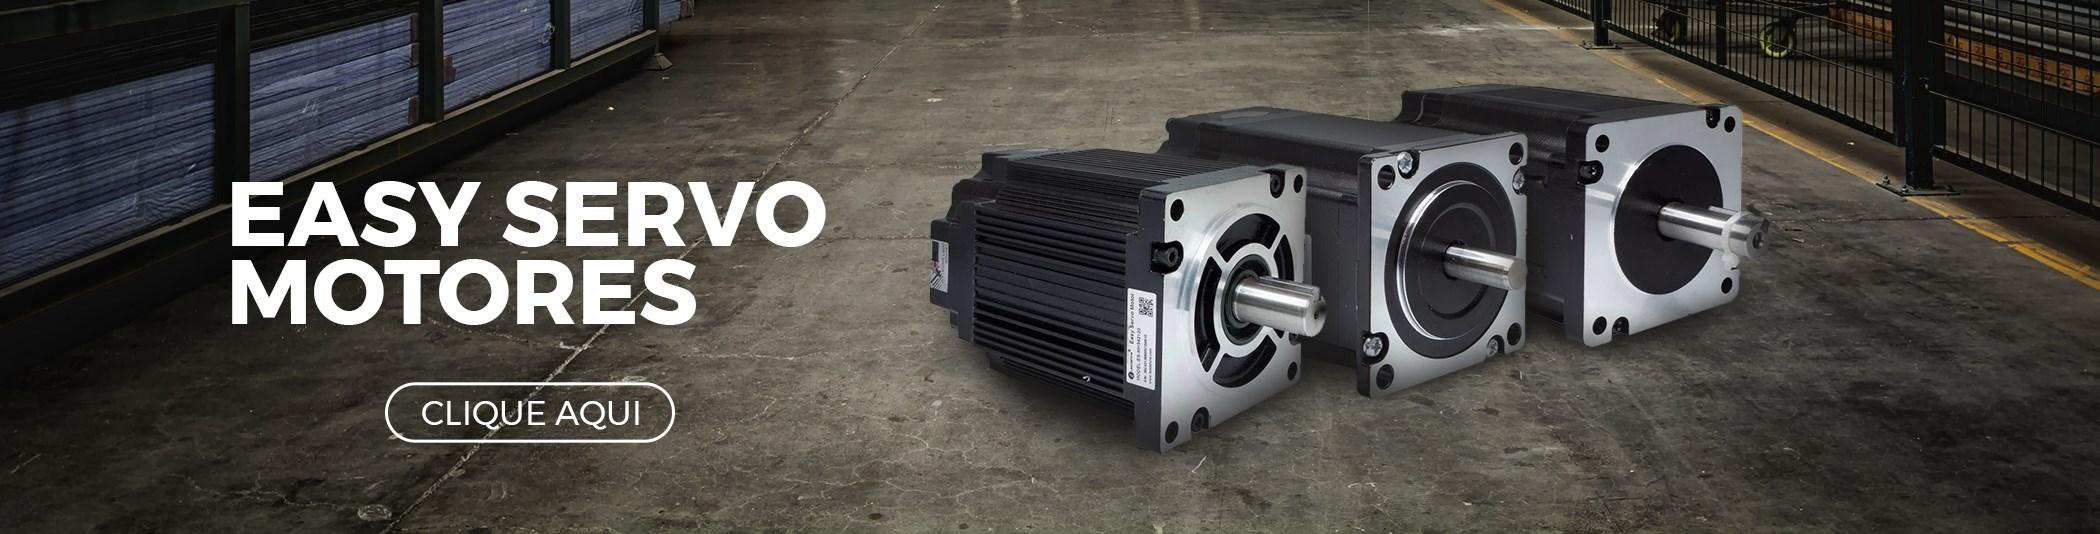 Easy servo motor